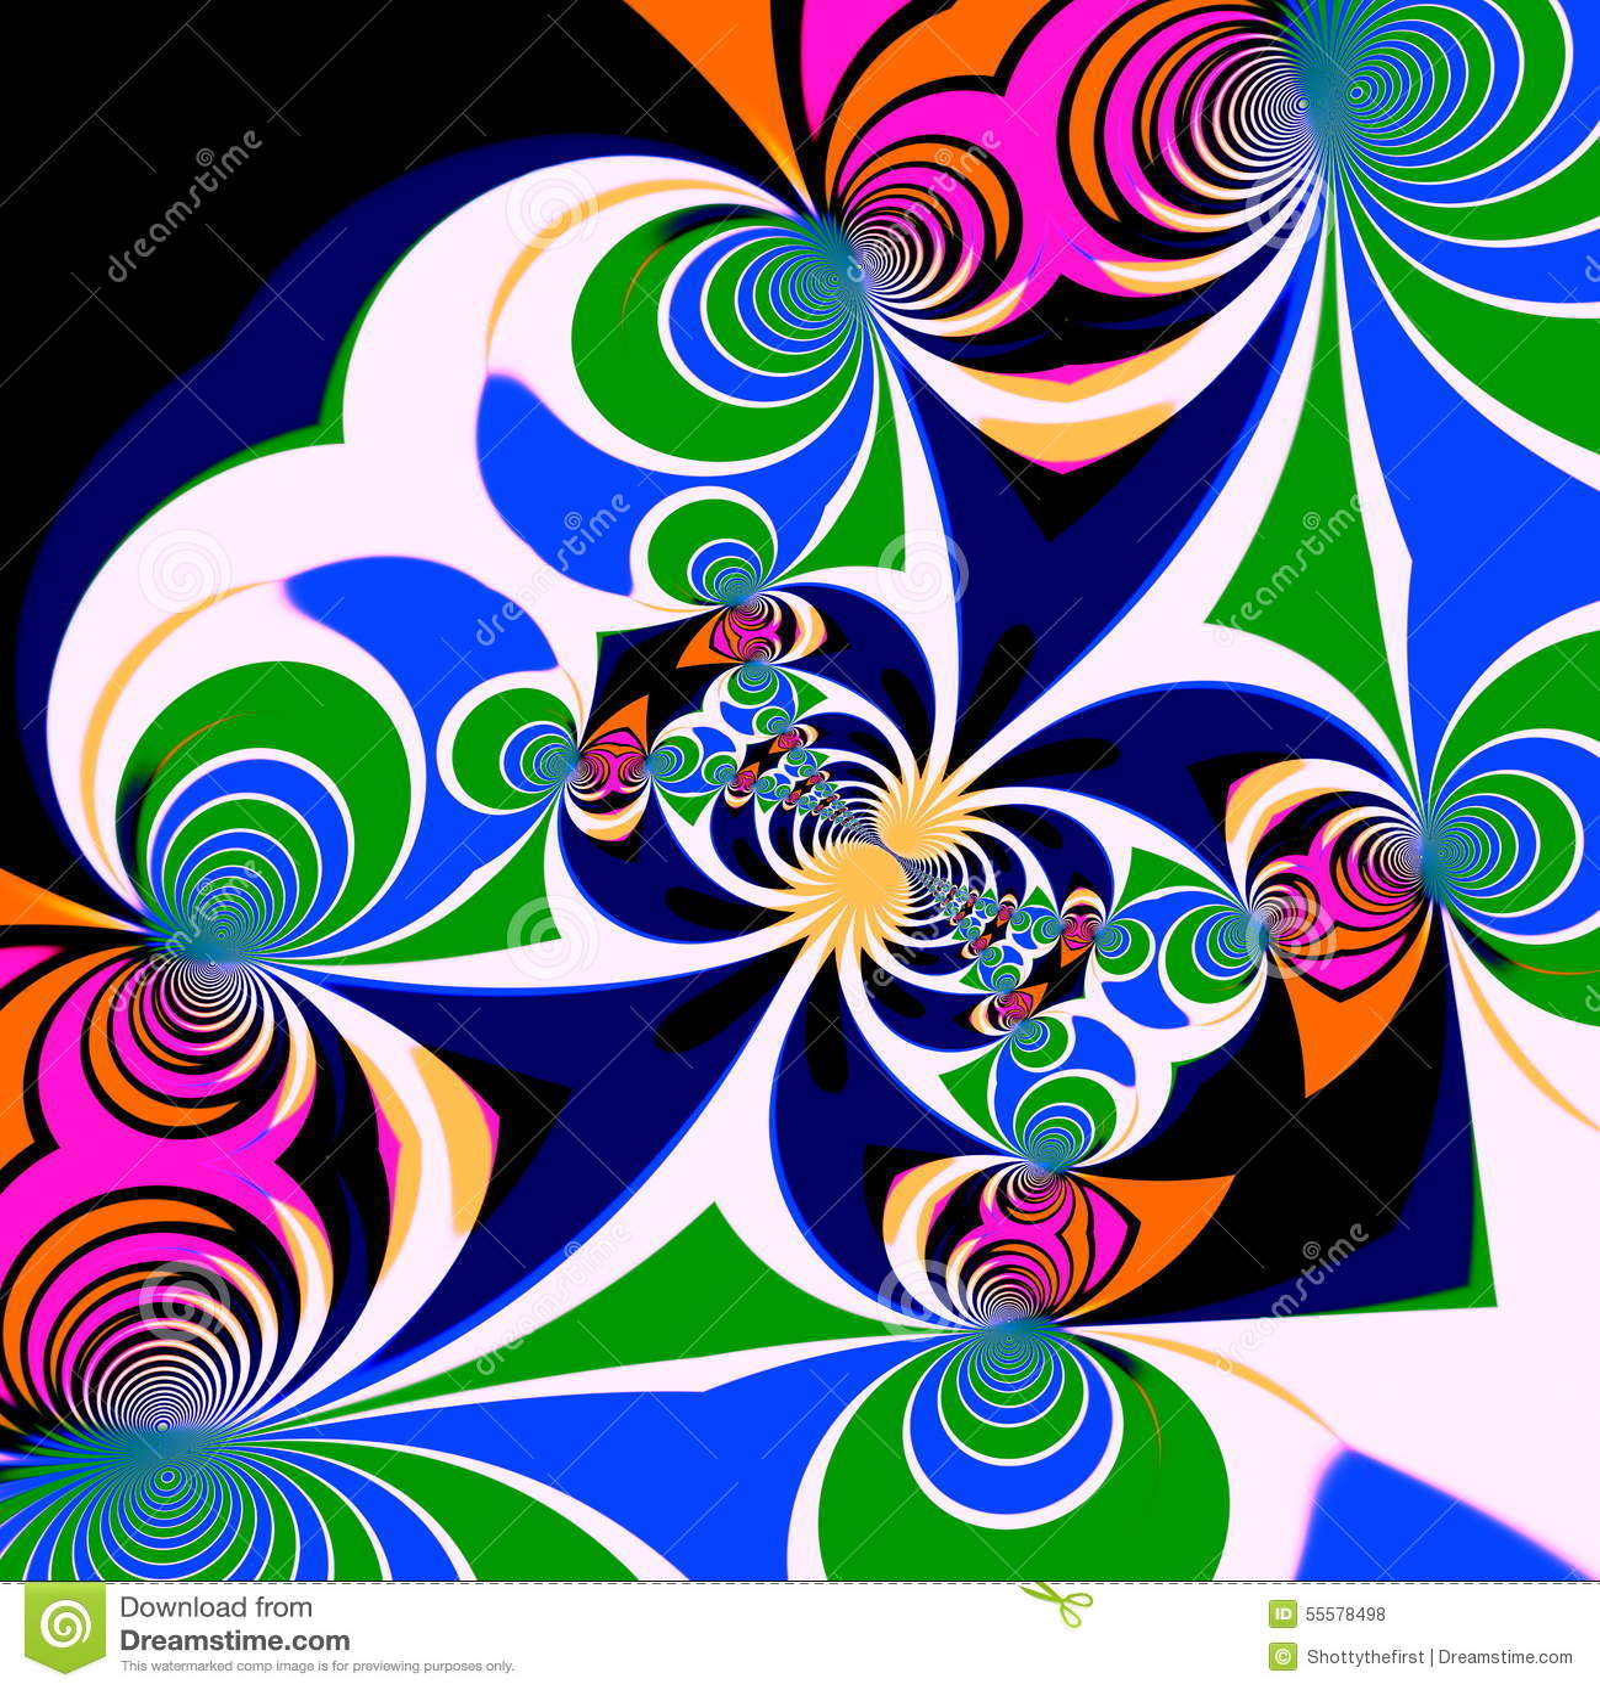 Symmetrical Abstract Art